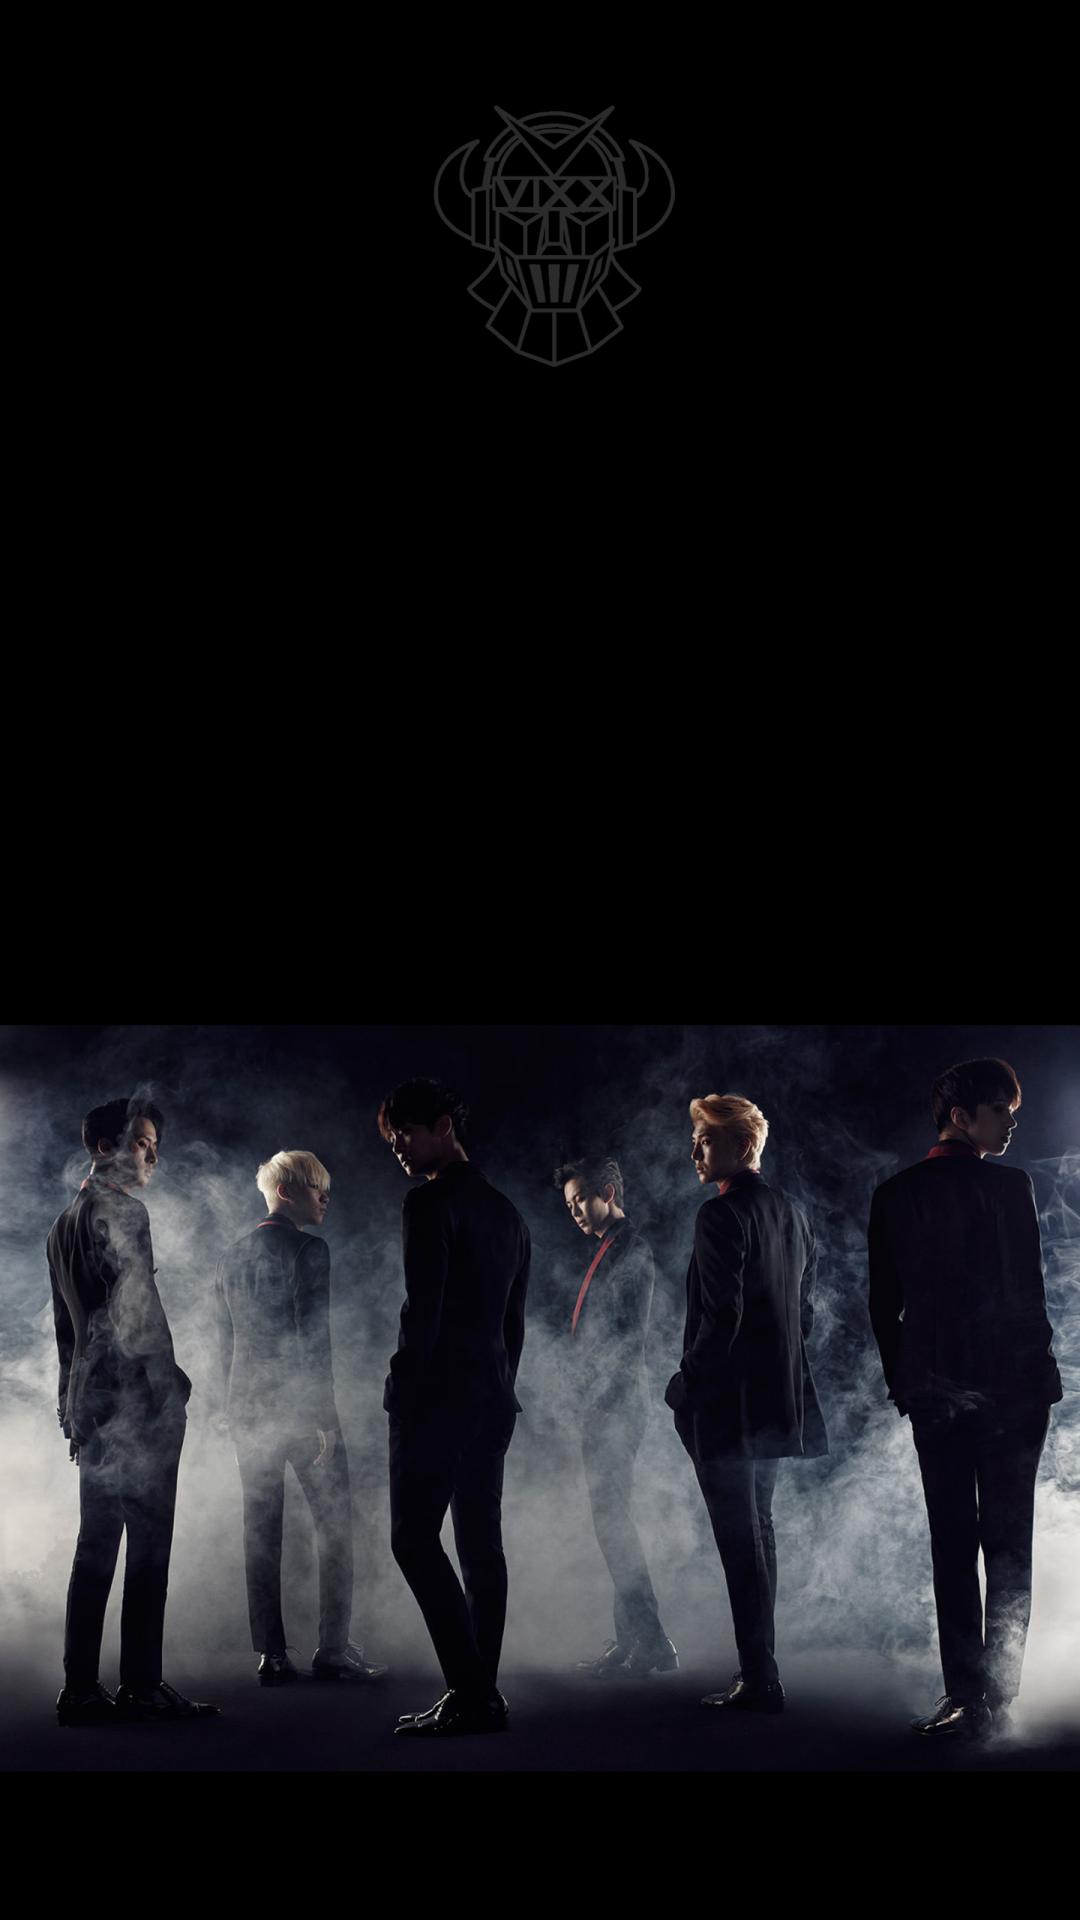 VIXX 』 iPhone, wallpaper Vixx wallpaper, Vixx, Shinee